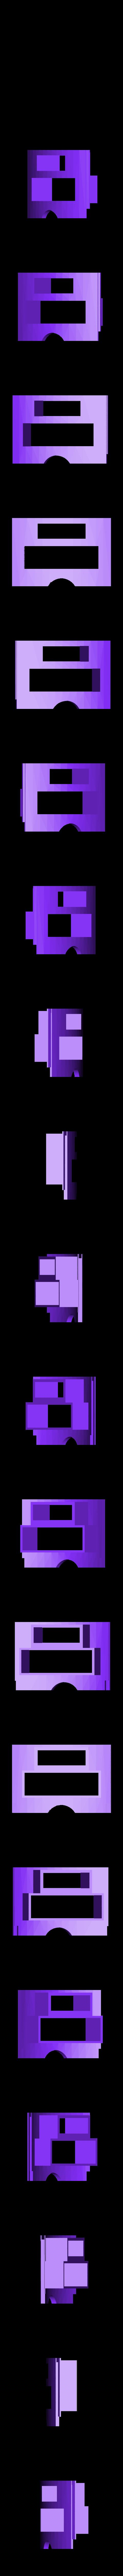 CACHE AR.STL Download free STL file Raspberry Pi case • 3D print object, YAN-D